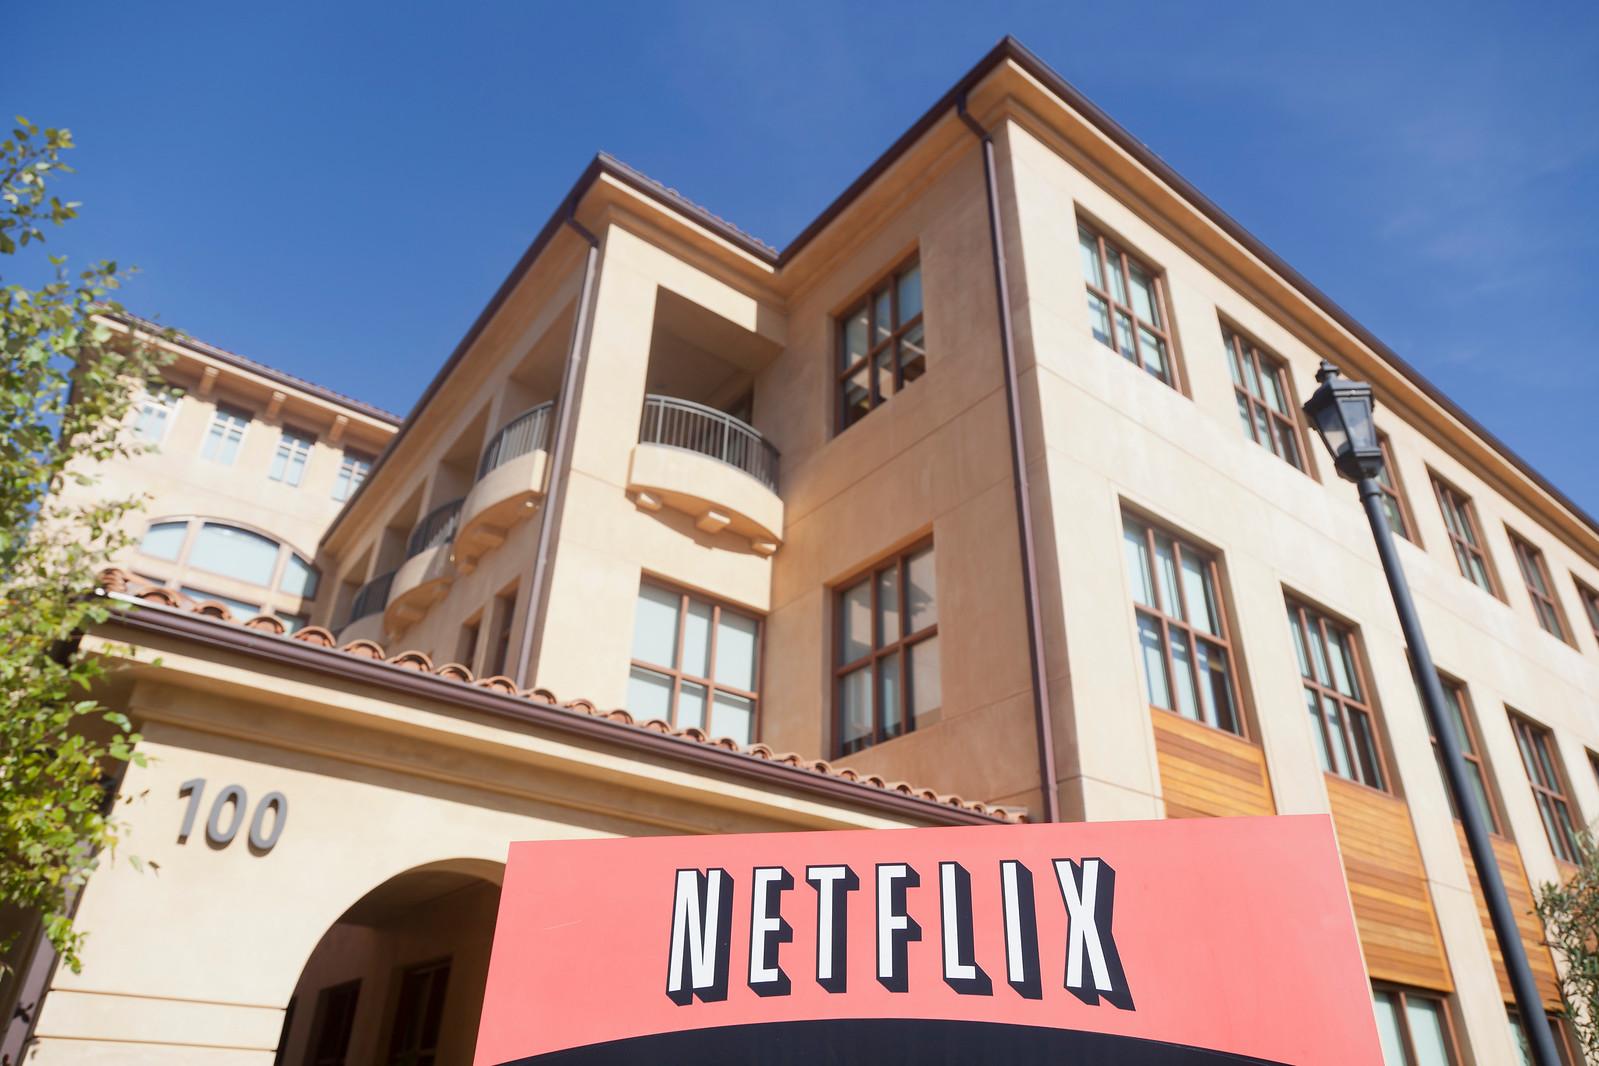 Netflix Los Gatos.jpg